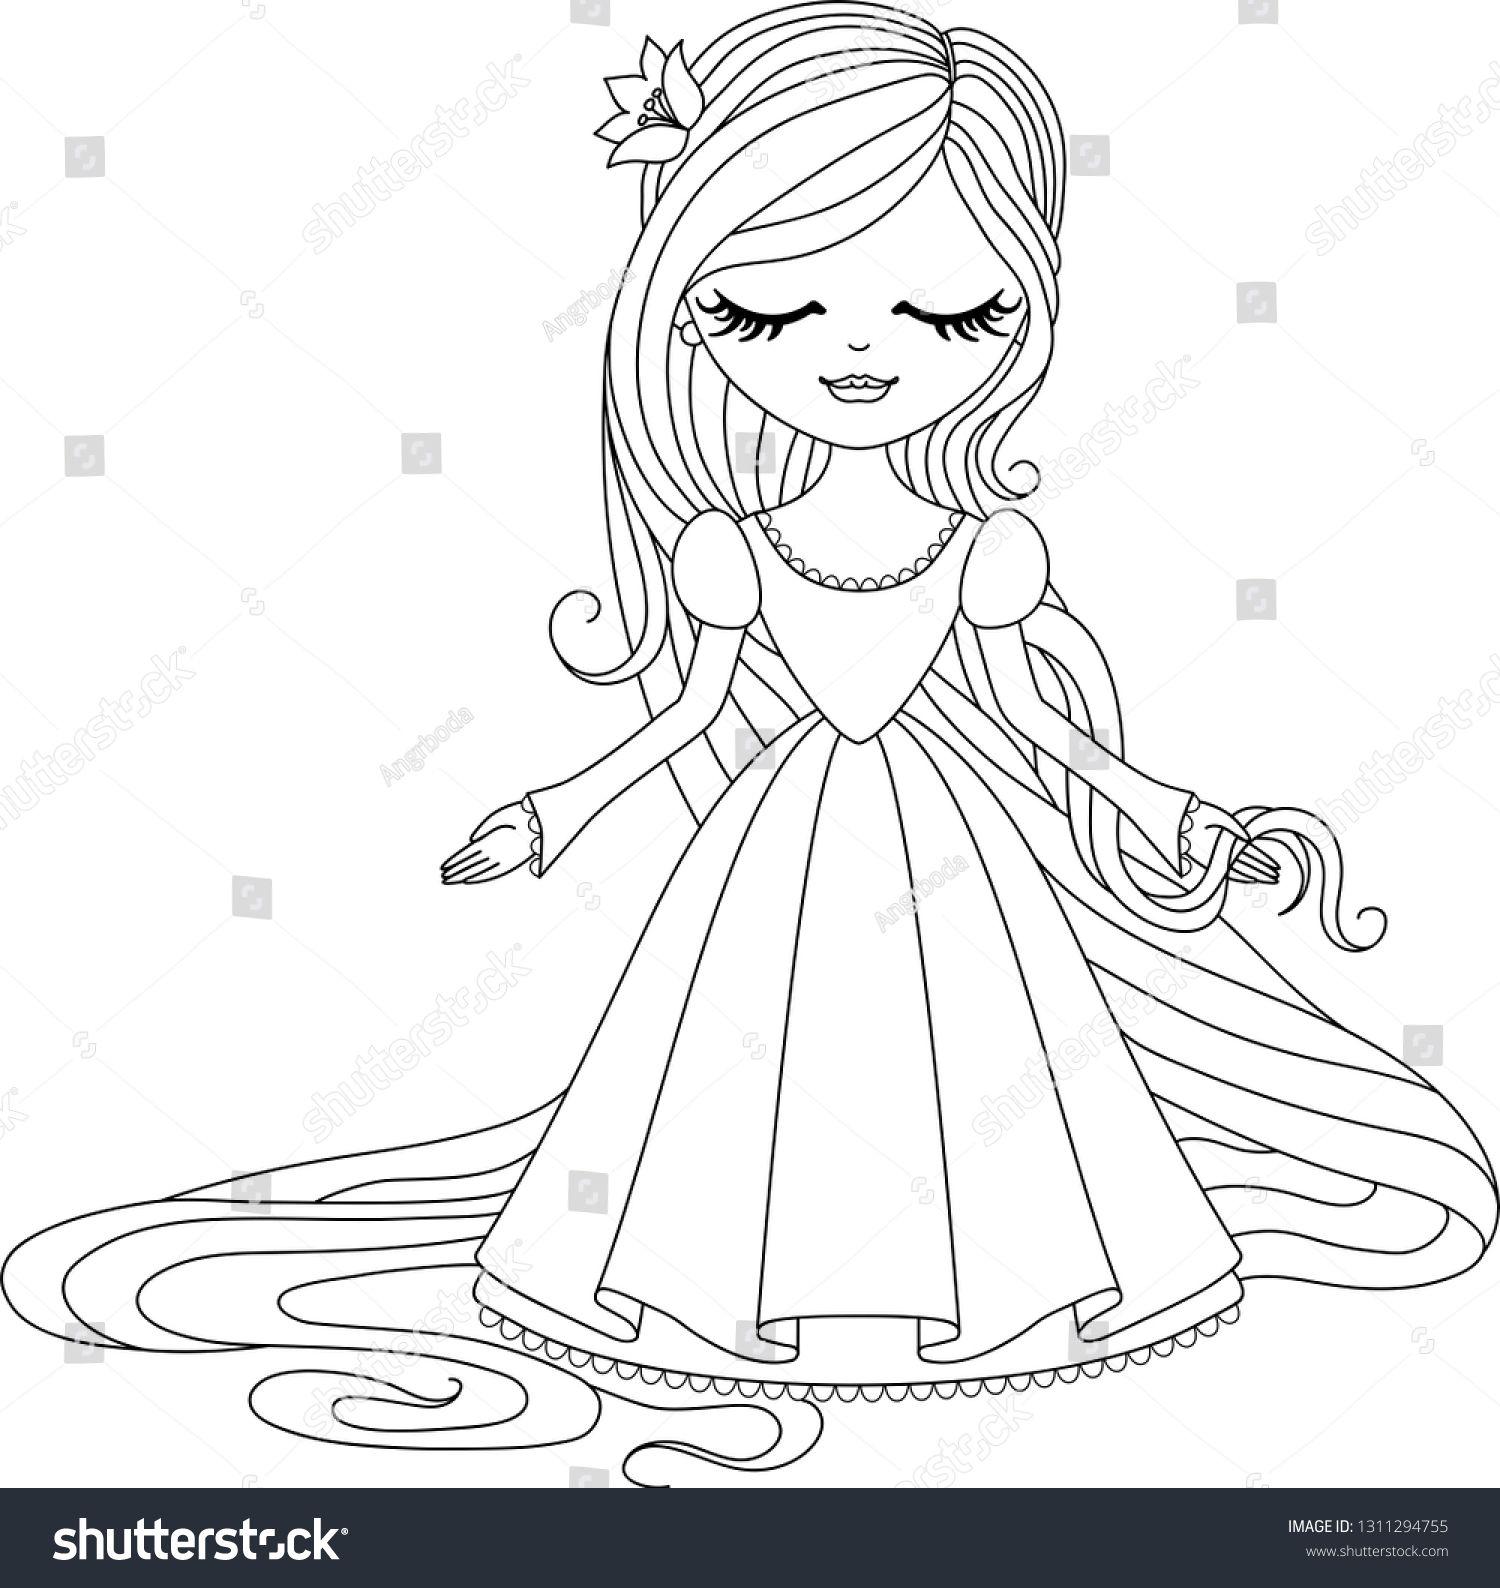 Cute Little Princess Rapunzel Black Outline On White Background Vector Illustration Ad Affiliate Rapun Princess Rapunzel Cute Princess Little Princess